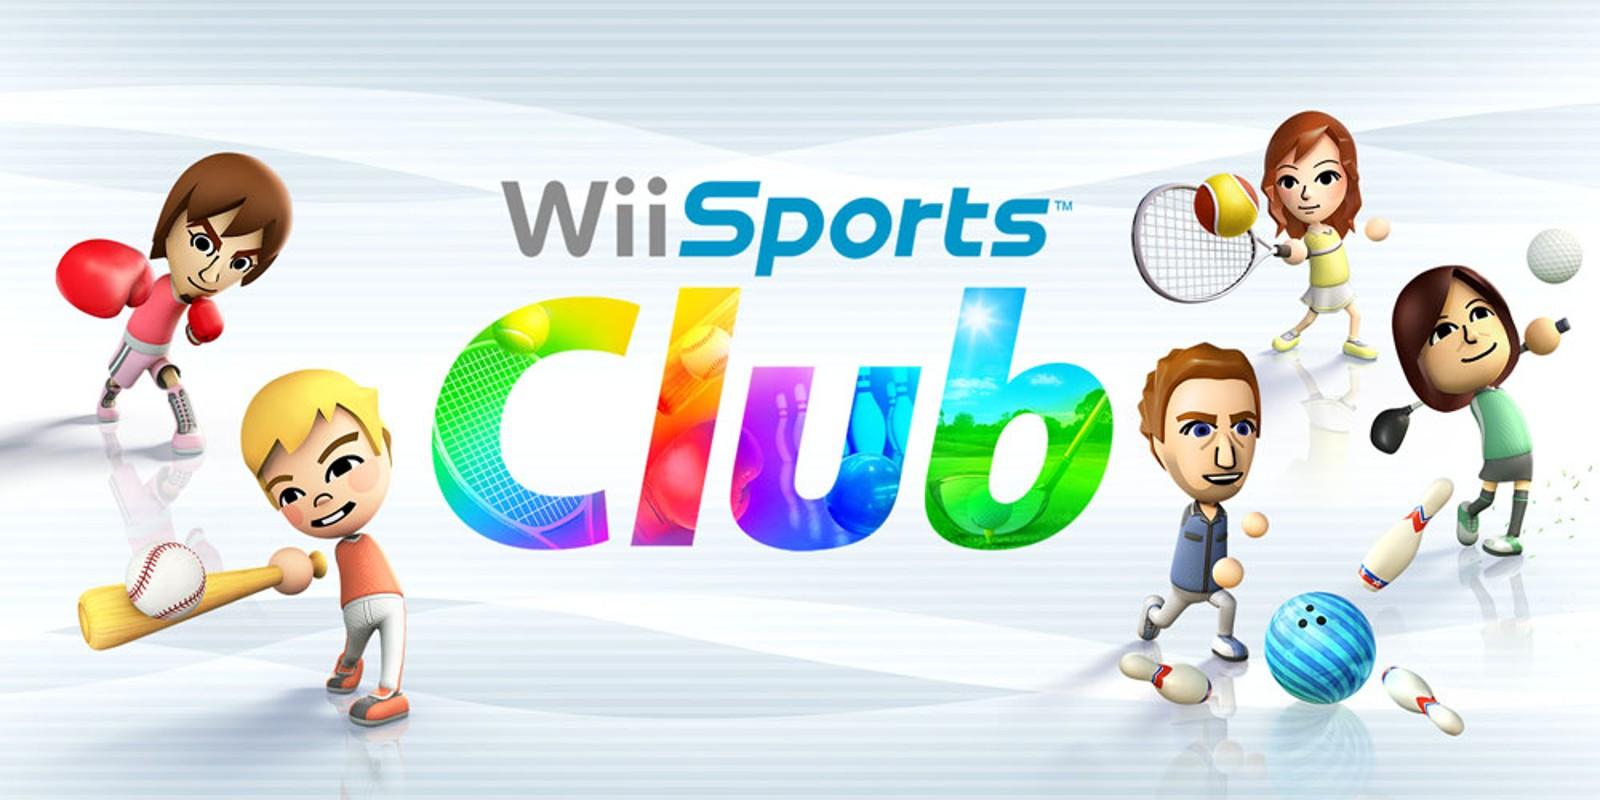 SI_WiiUDS_WiiSportsClub_image1600w.jpg